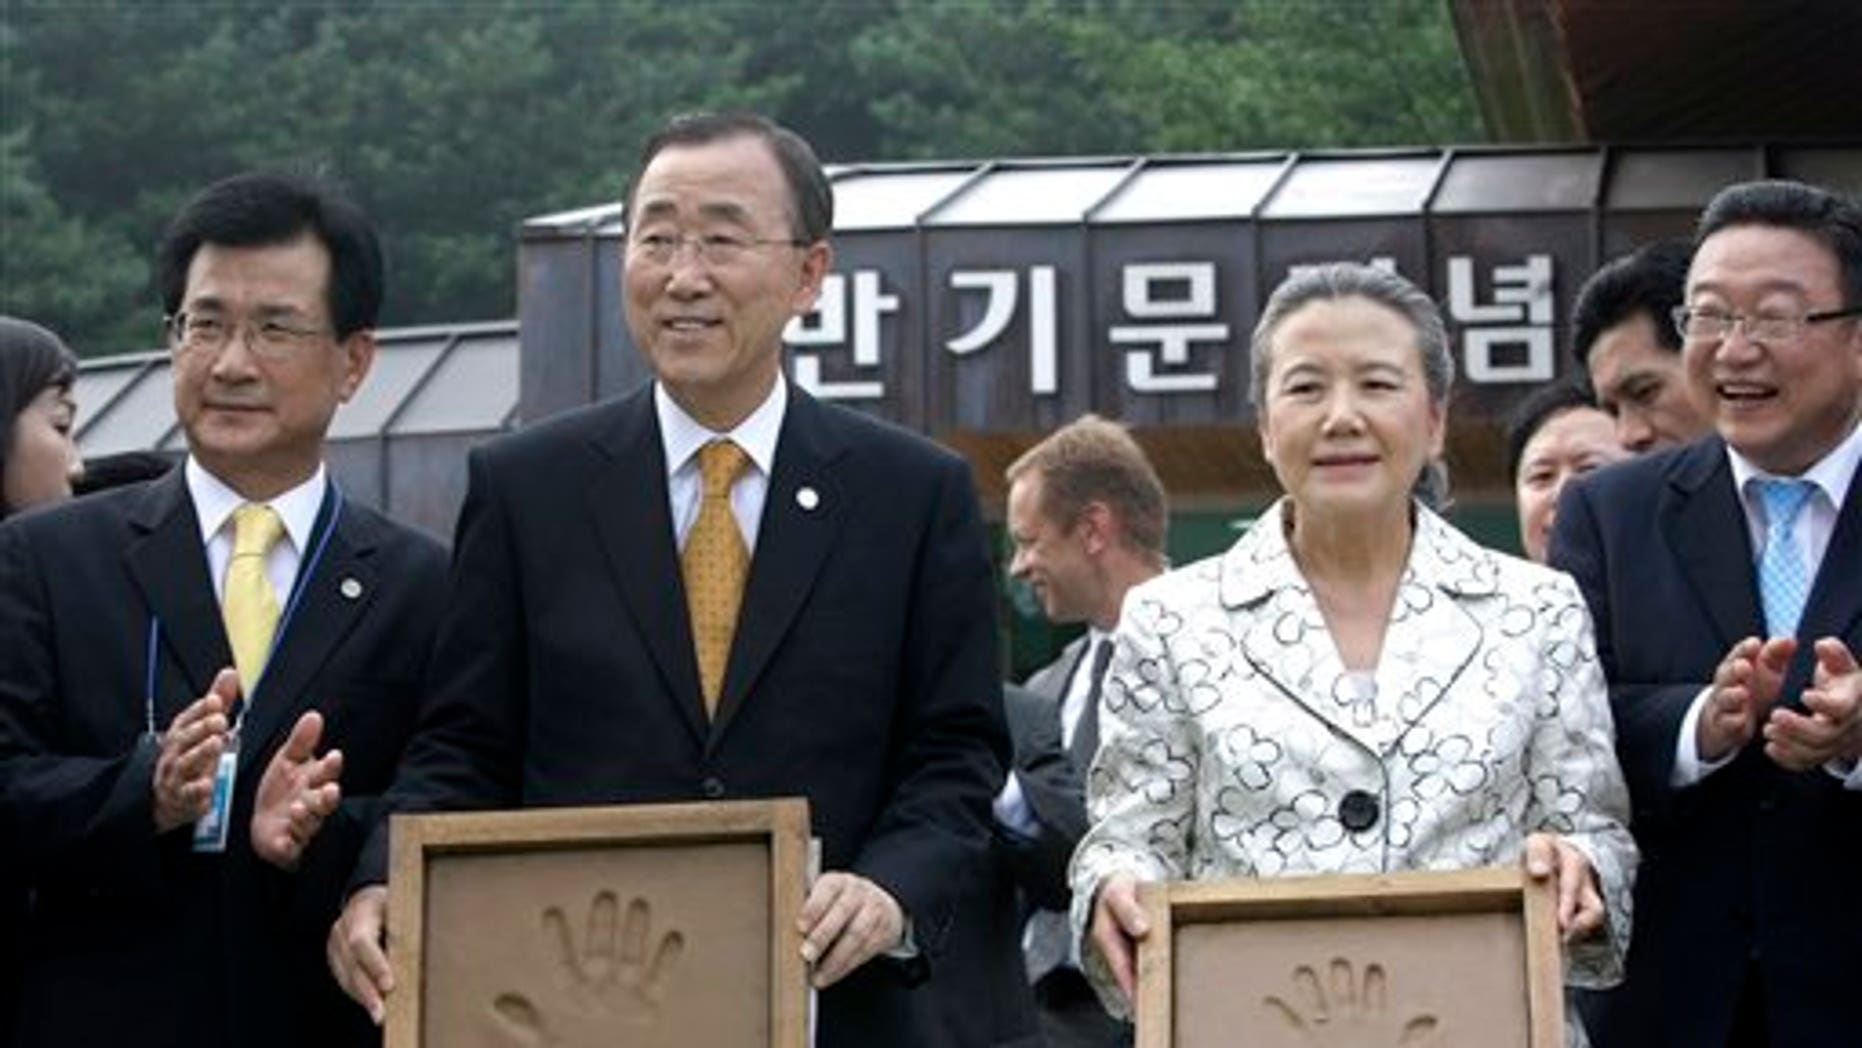 August 14: U.N. Secretary-General Ban Ki-moon  and his wife, Yoo Soon-taek, show their hand prints during his visit to his hometown in Eumseong, South Korea.